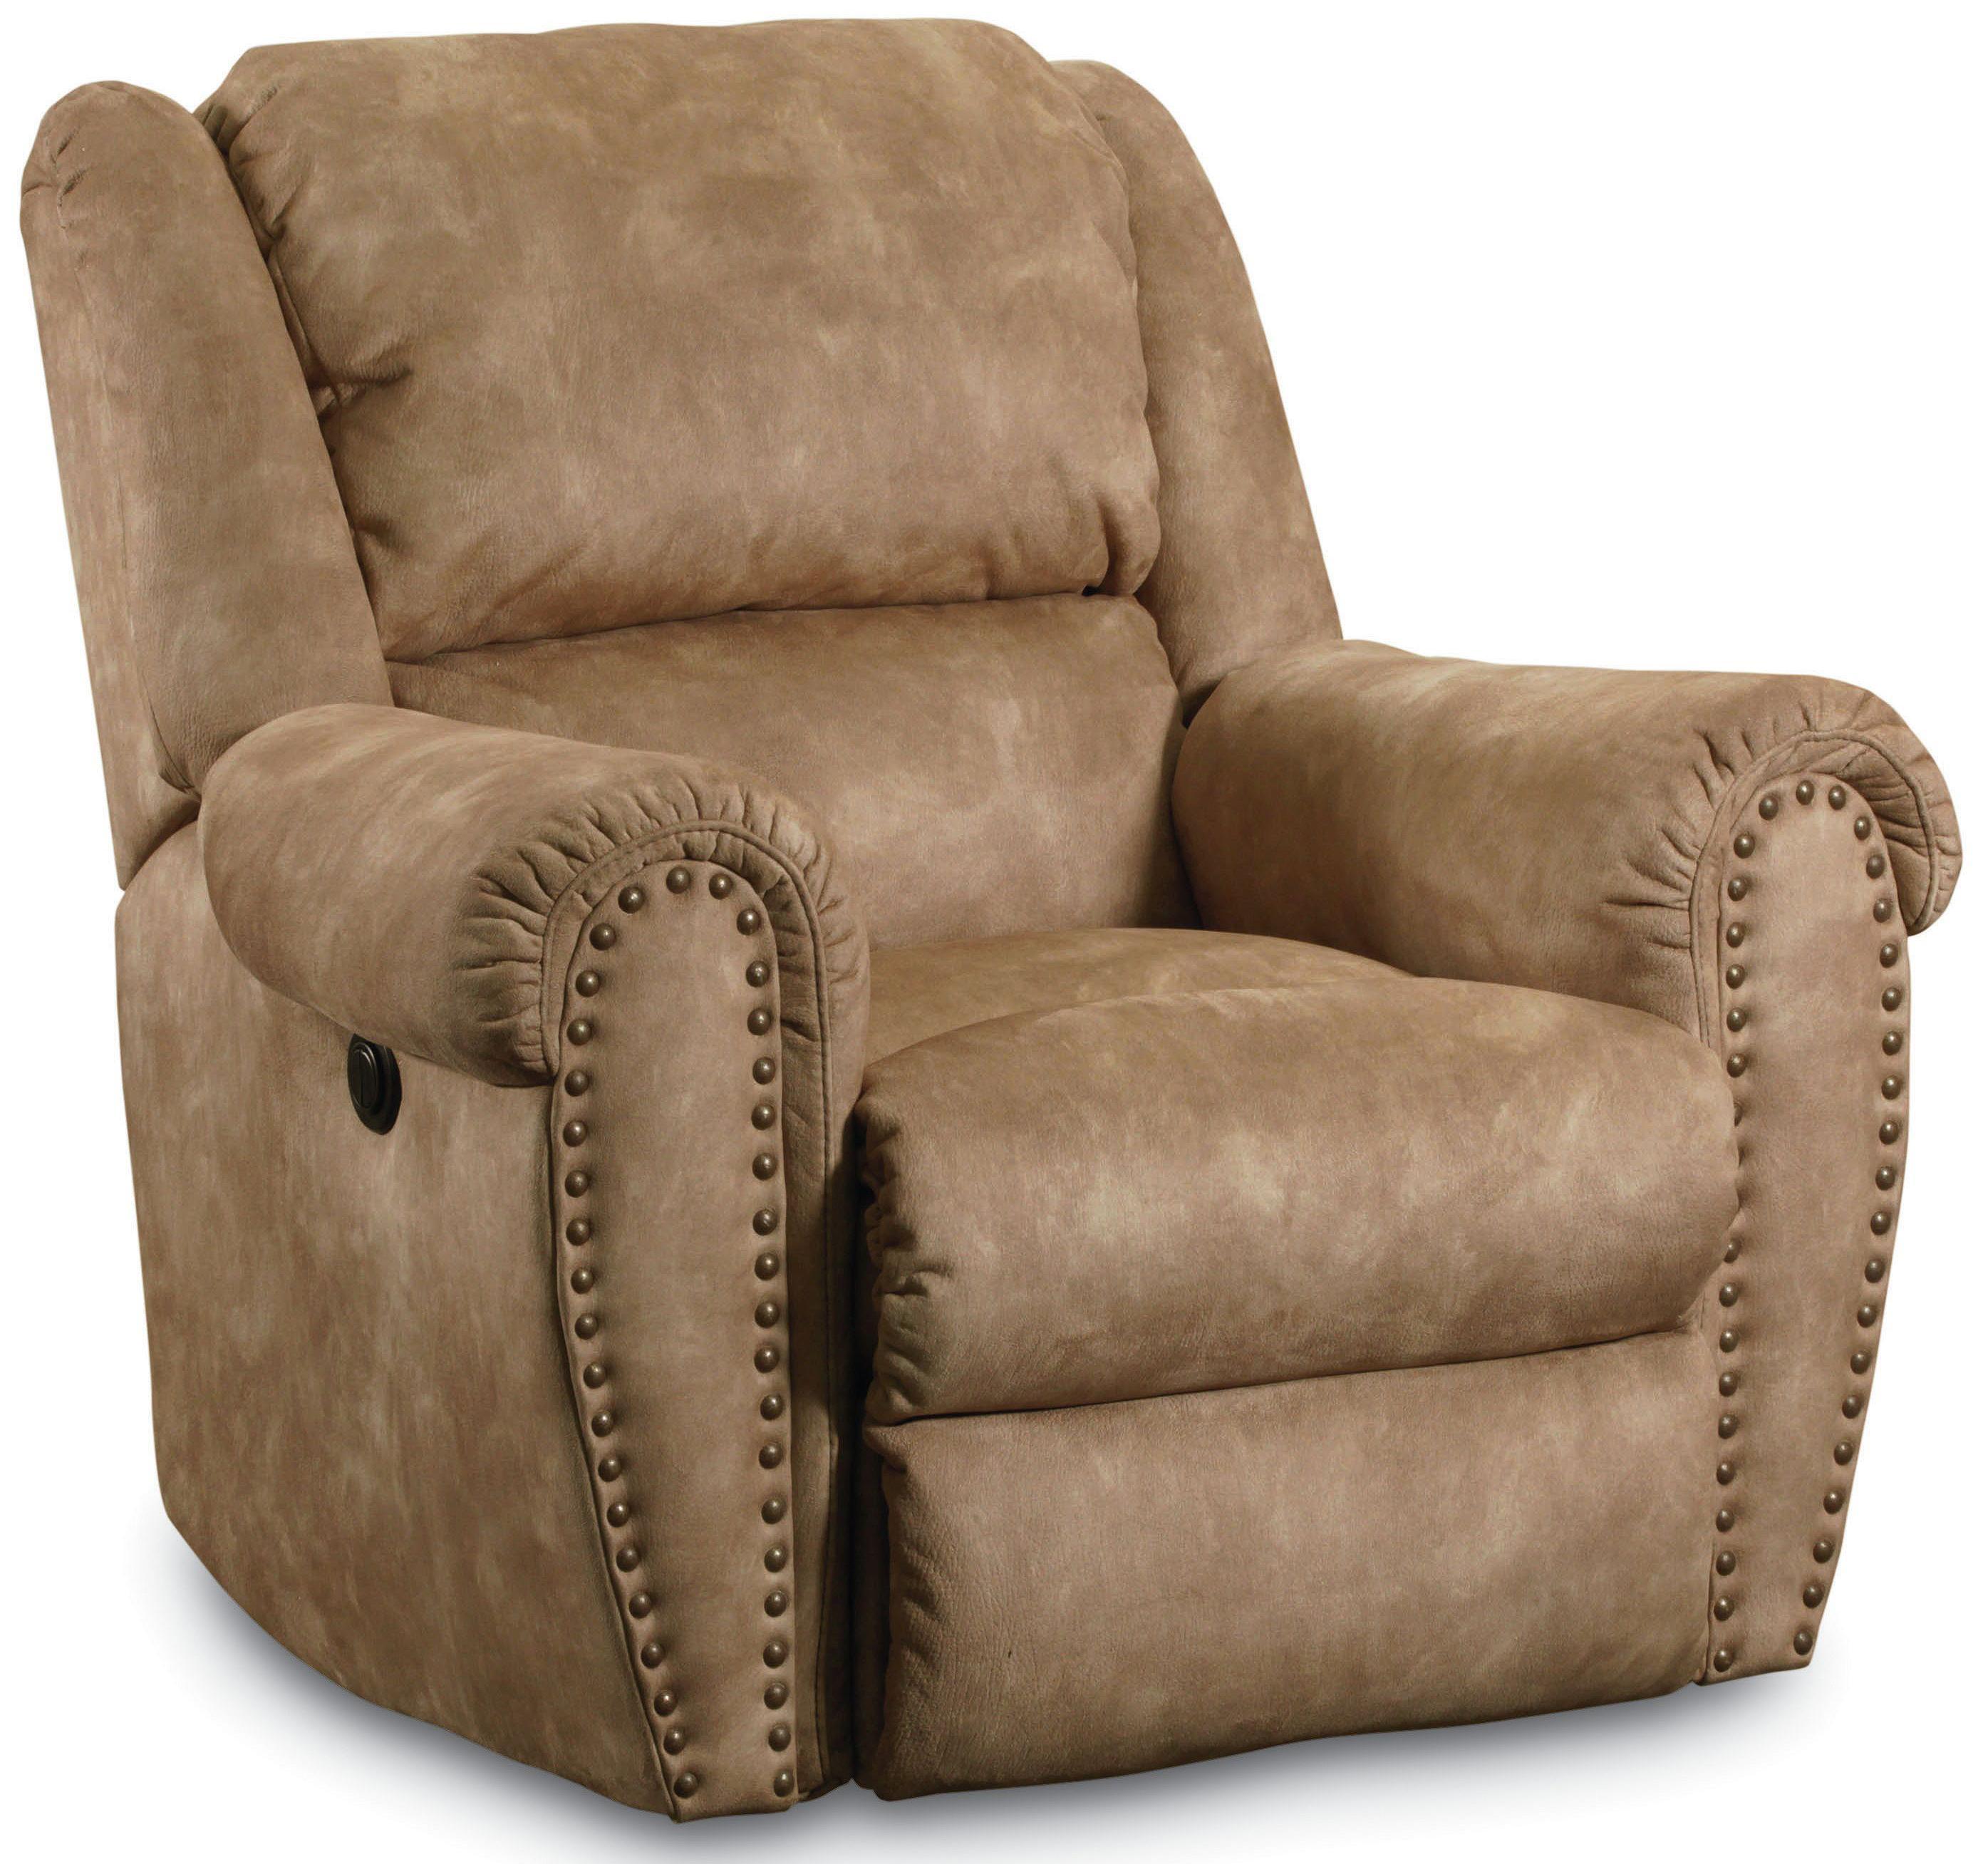 reclining sofa with nailhead trim timber bed lane summerlin traditional rocker recliner nail head